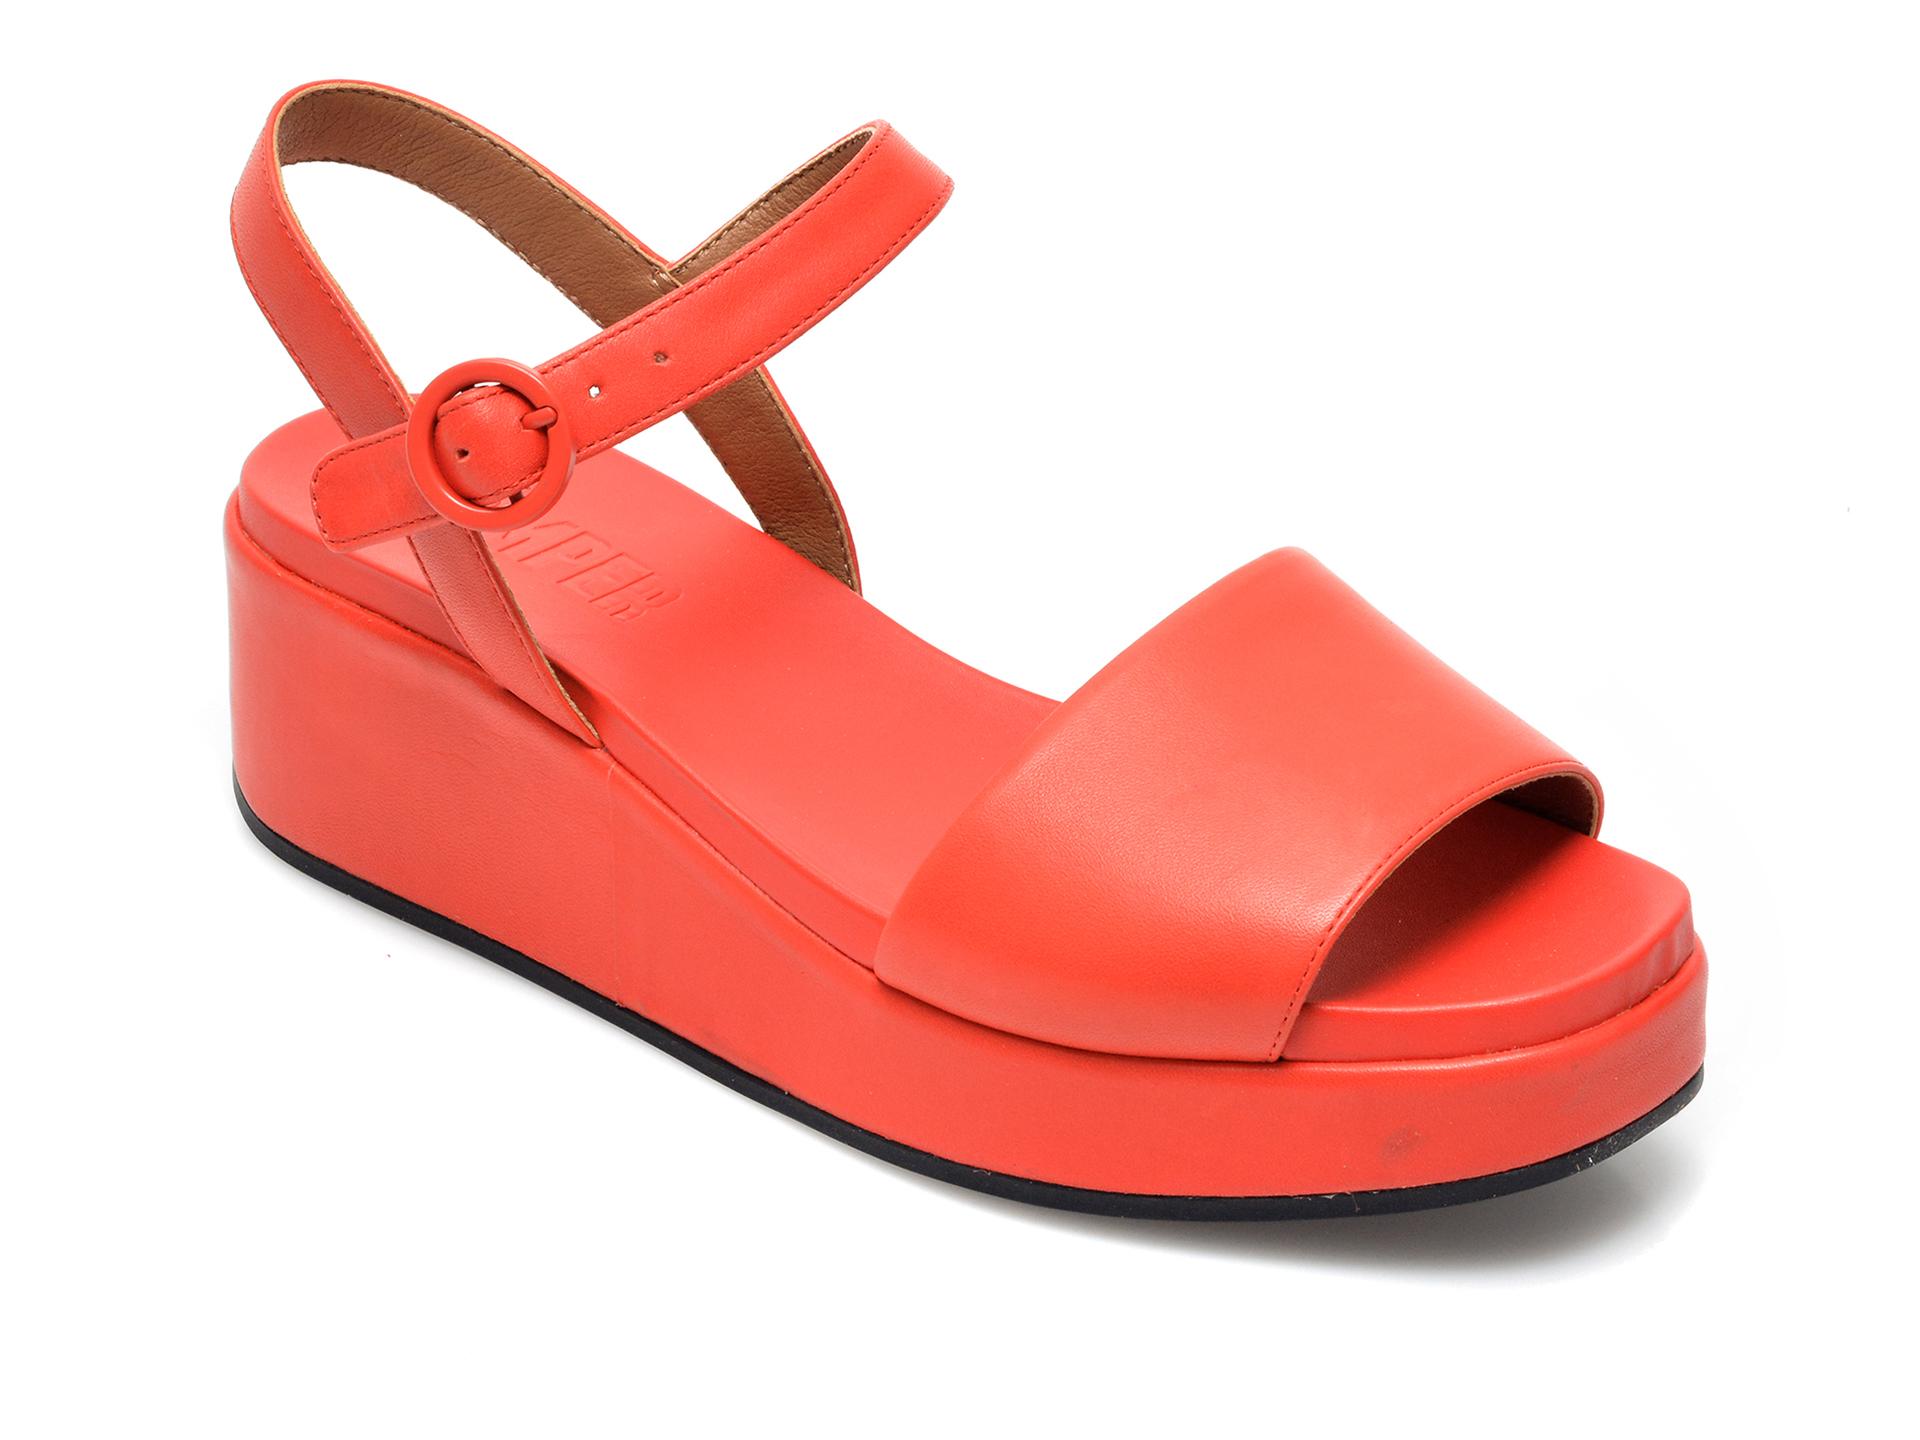 Sandale CAMPER rosii, K200564, din piele naturala imagine otter.ro 2021